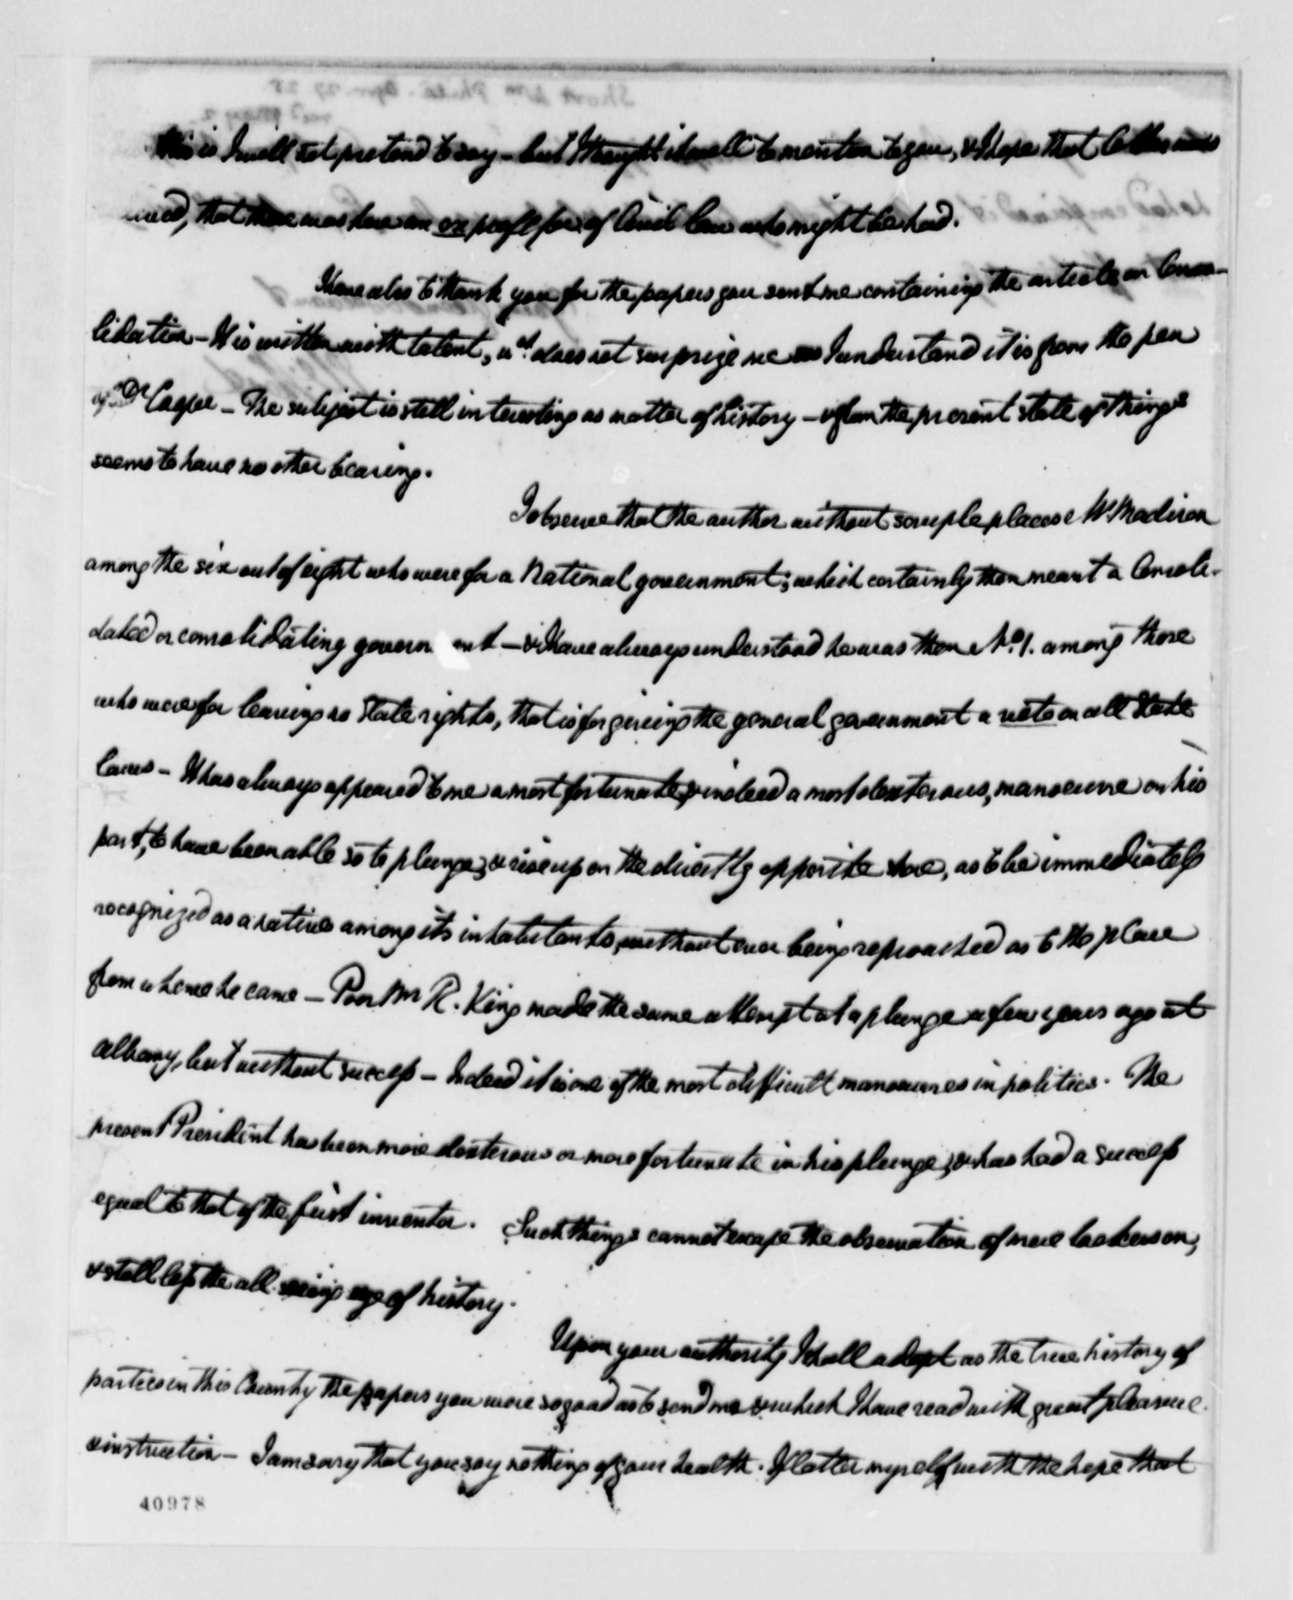 William Short to Thomas Jefferson, April 27, 1825